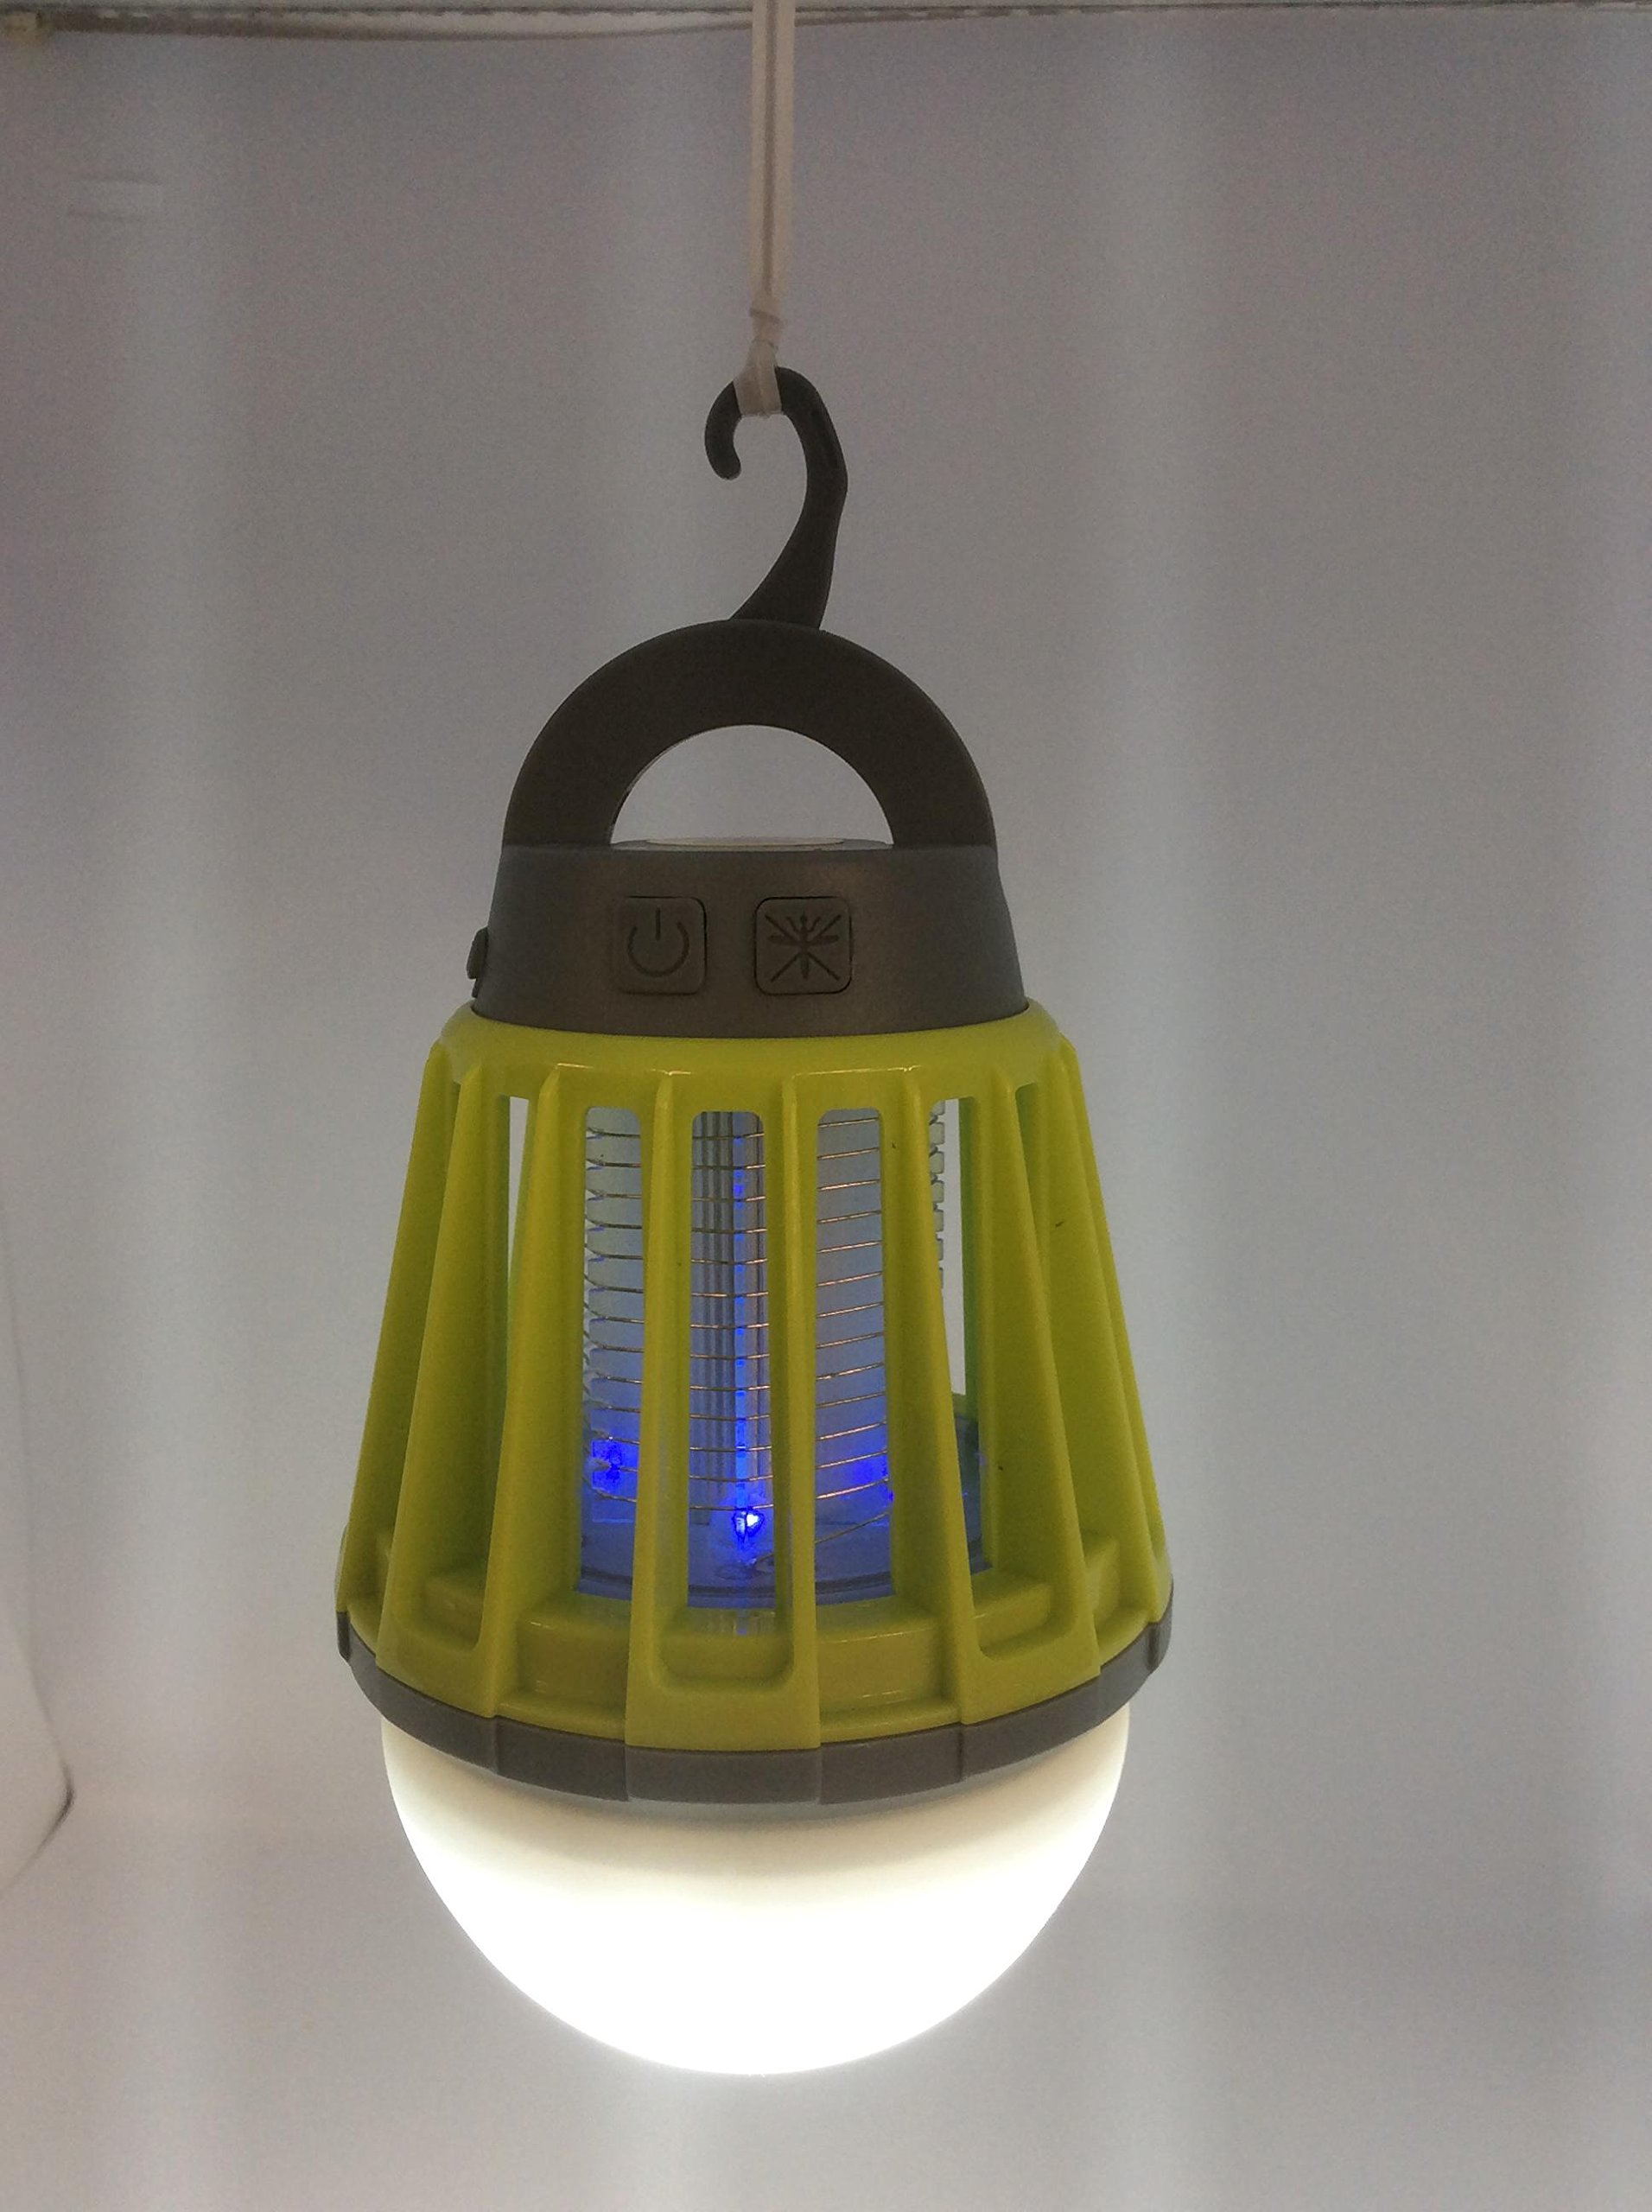 Hydrobreeze 2 in 1 Lantern+Mosquito Zapper-Green-2 by Hydrobreeze